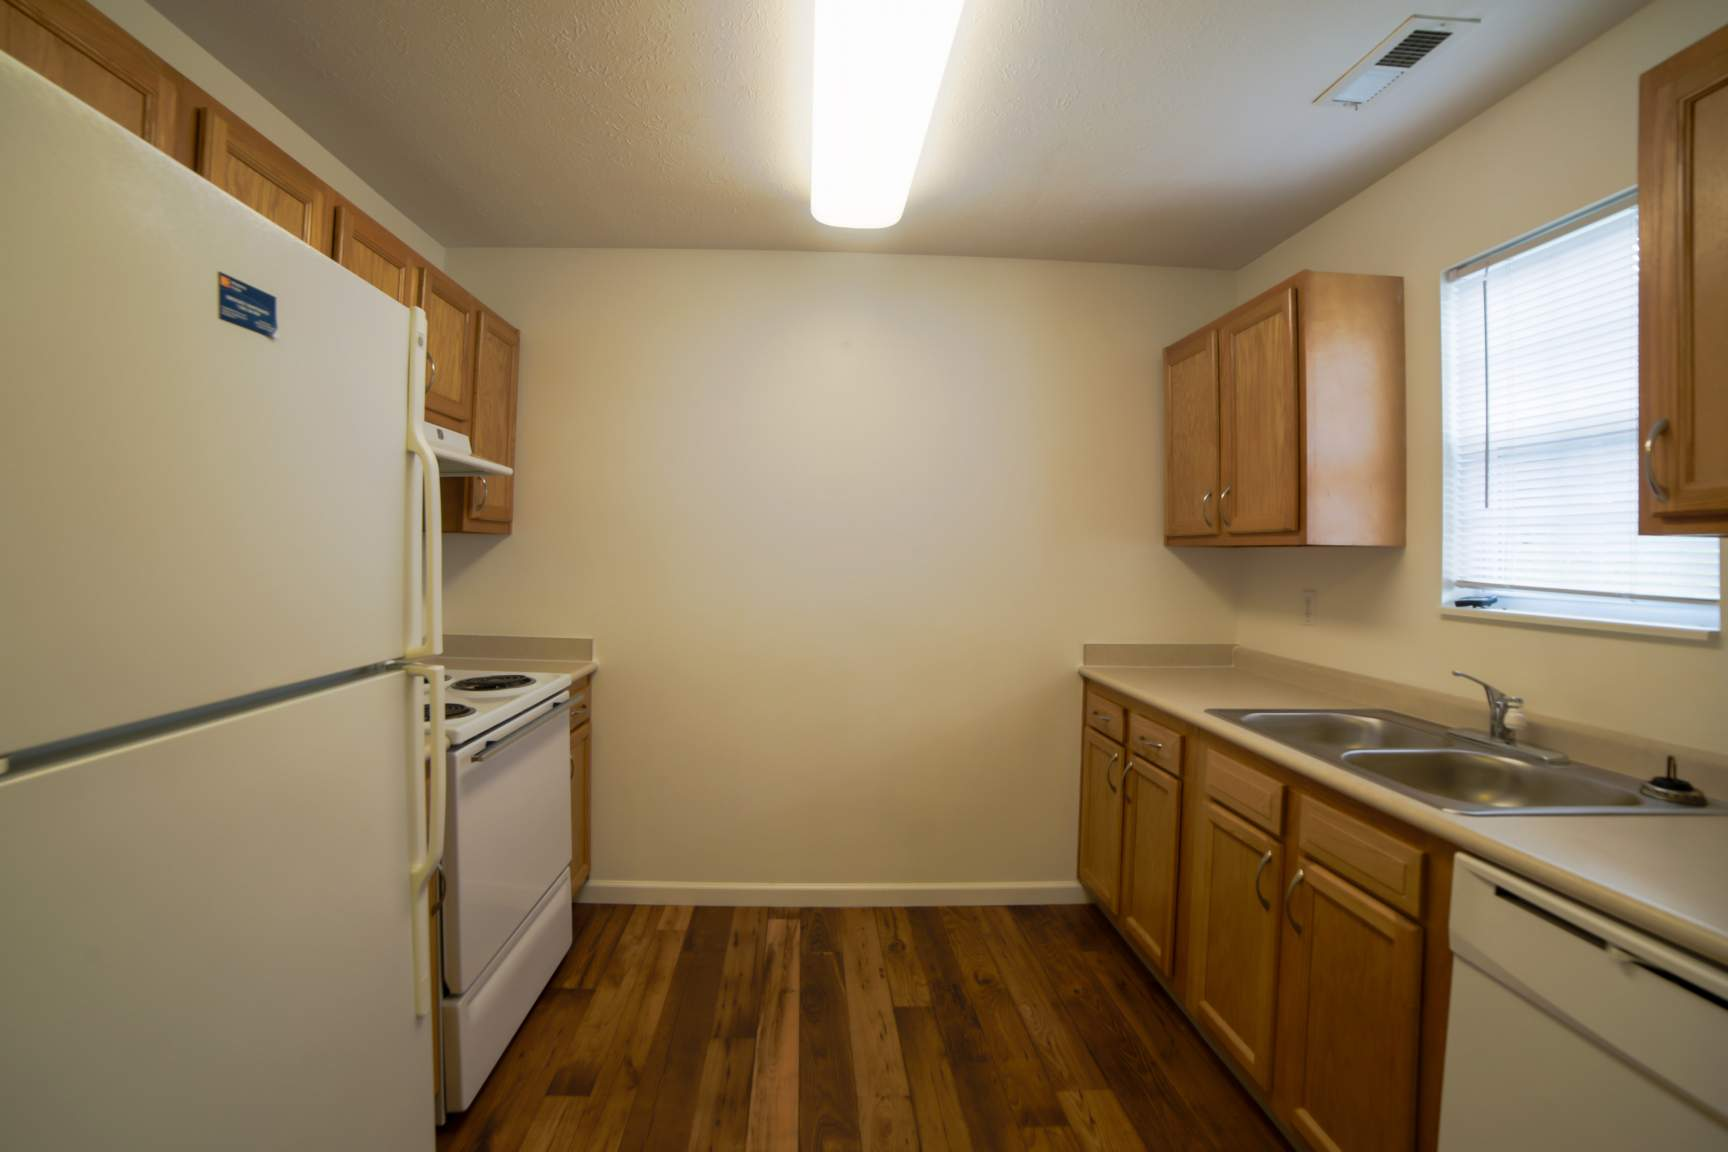 Allegheny Pointe | Miller-Valentine Residential Property ...